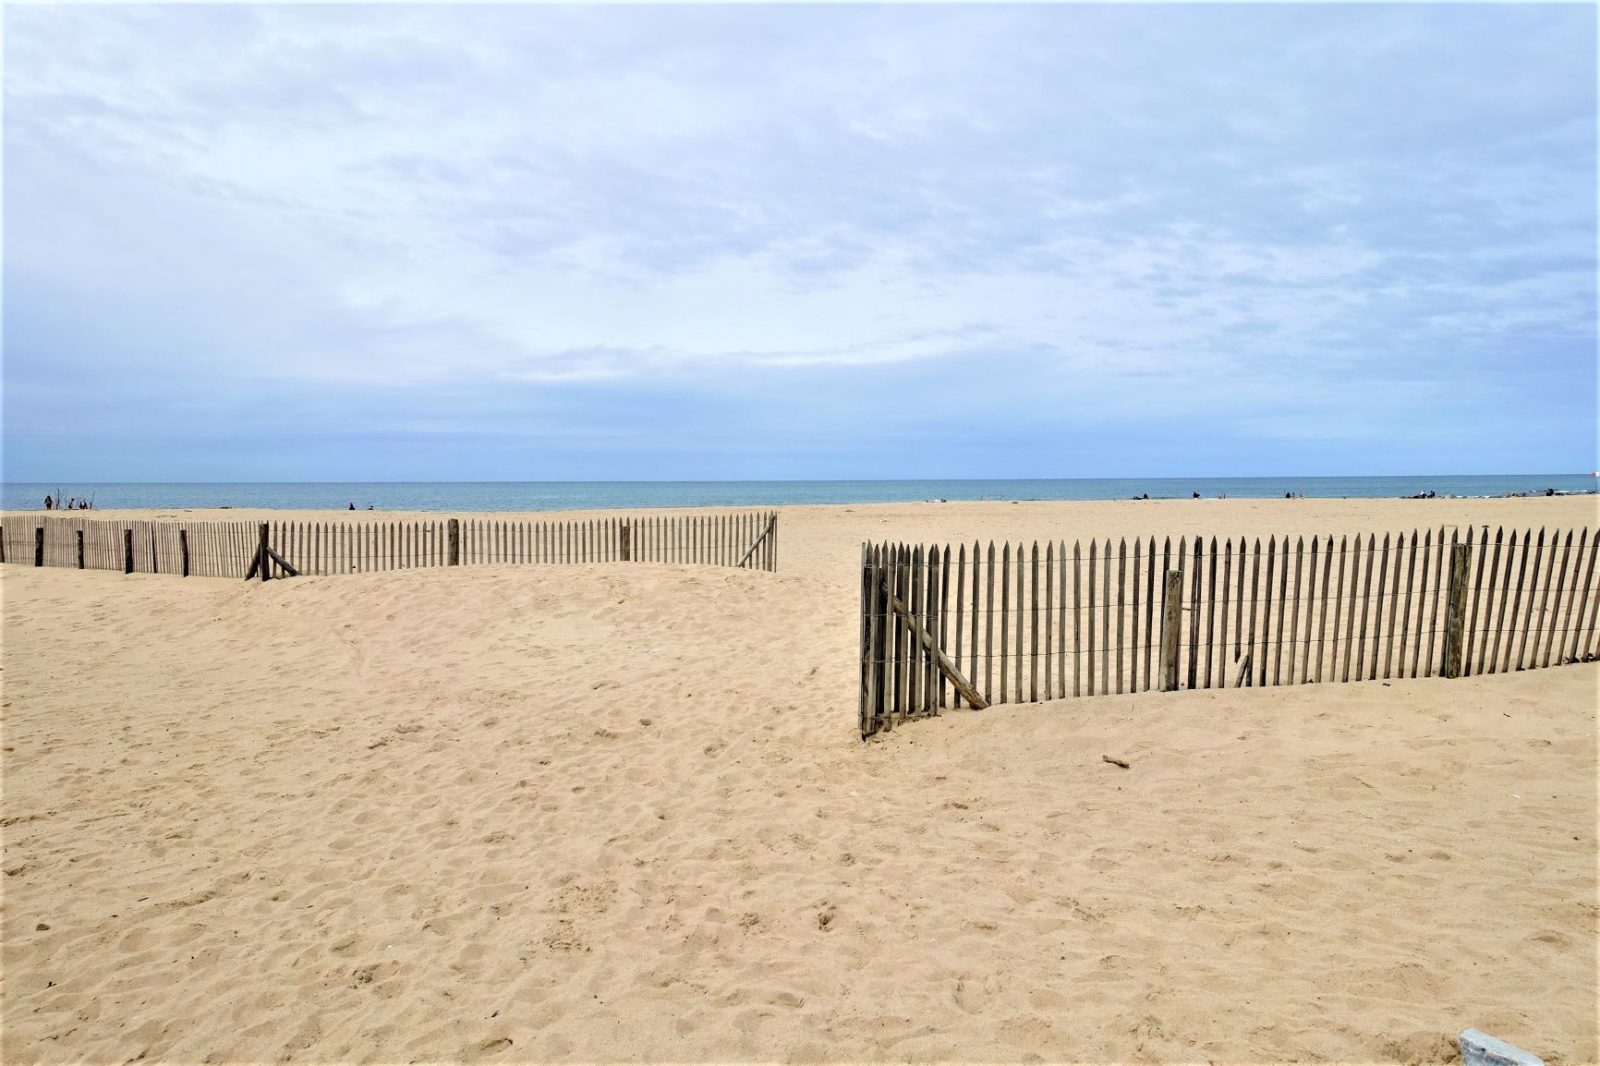 stranden vestkysten frankrike